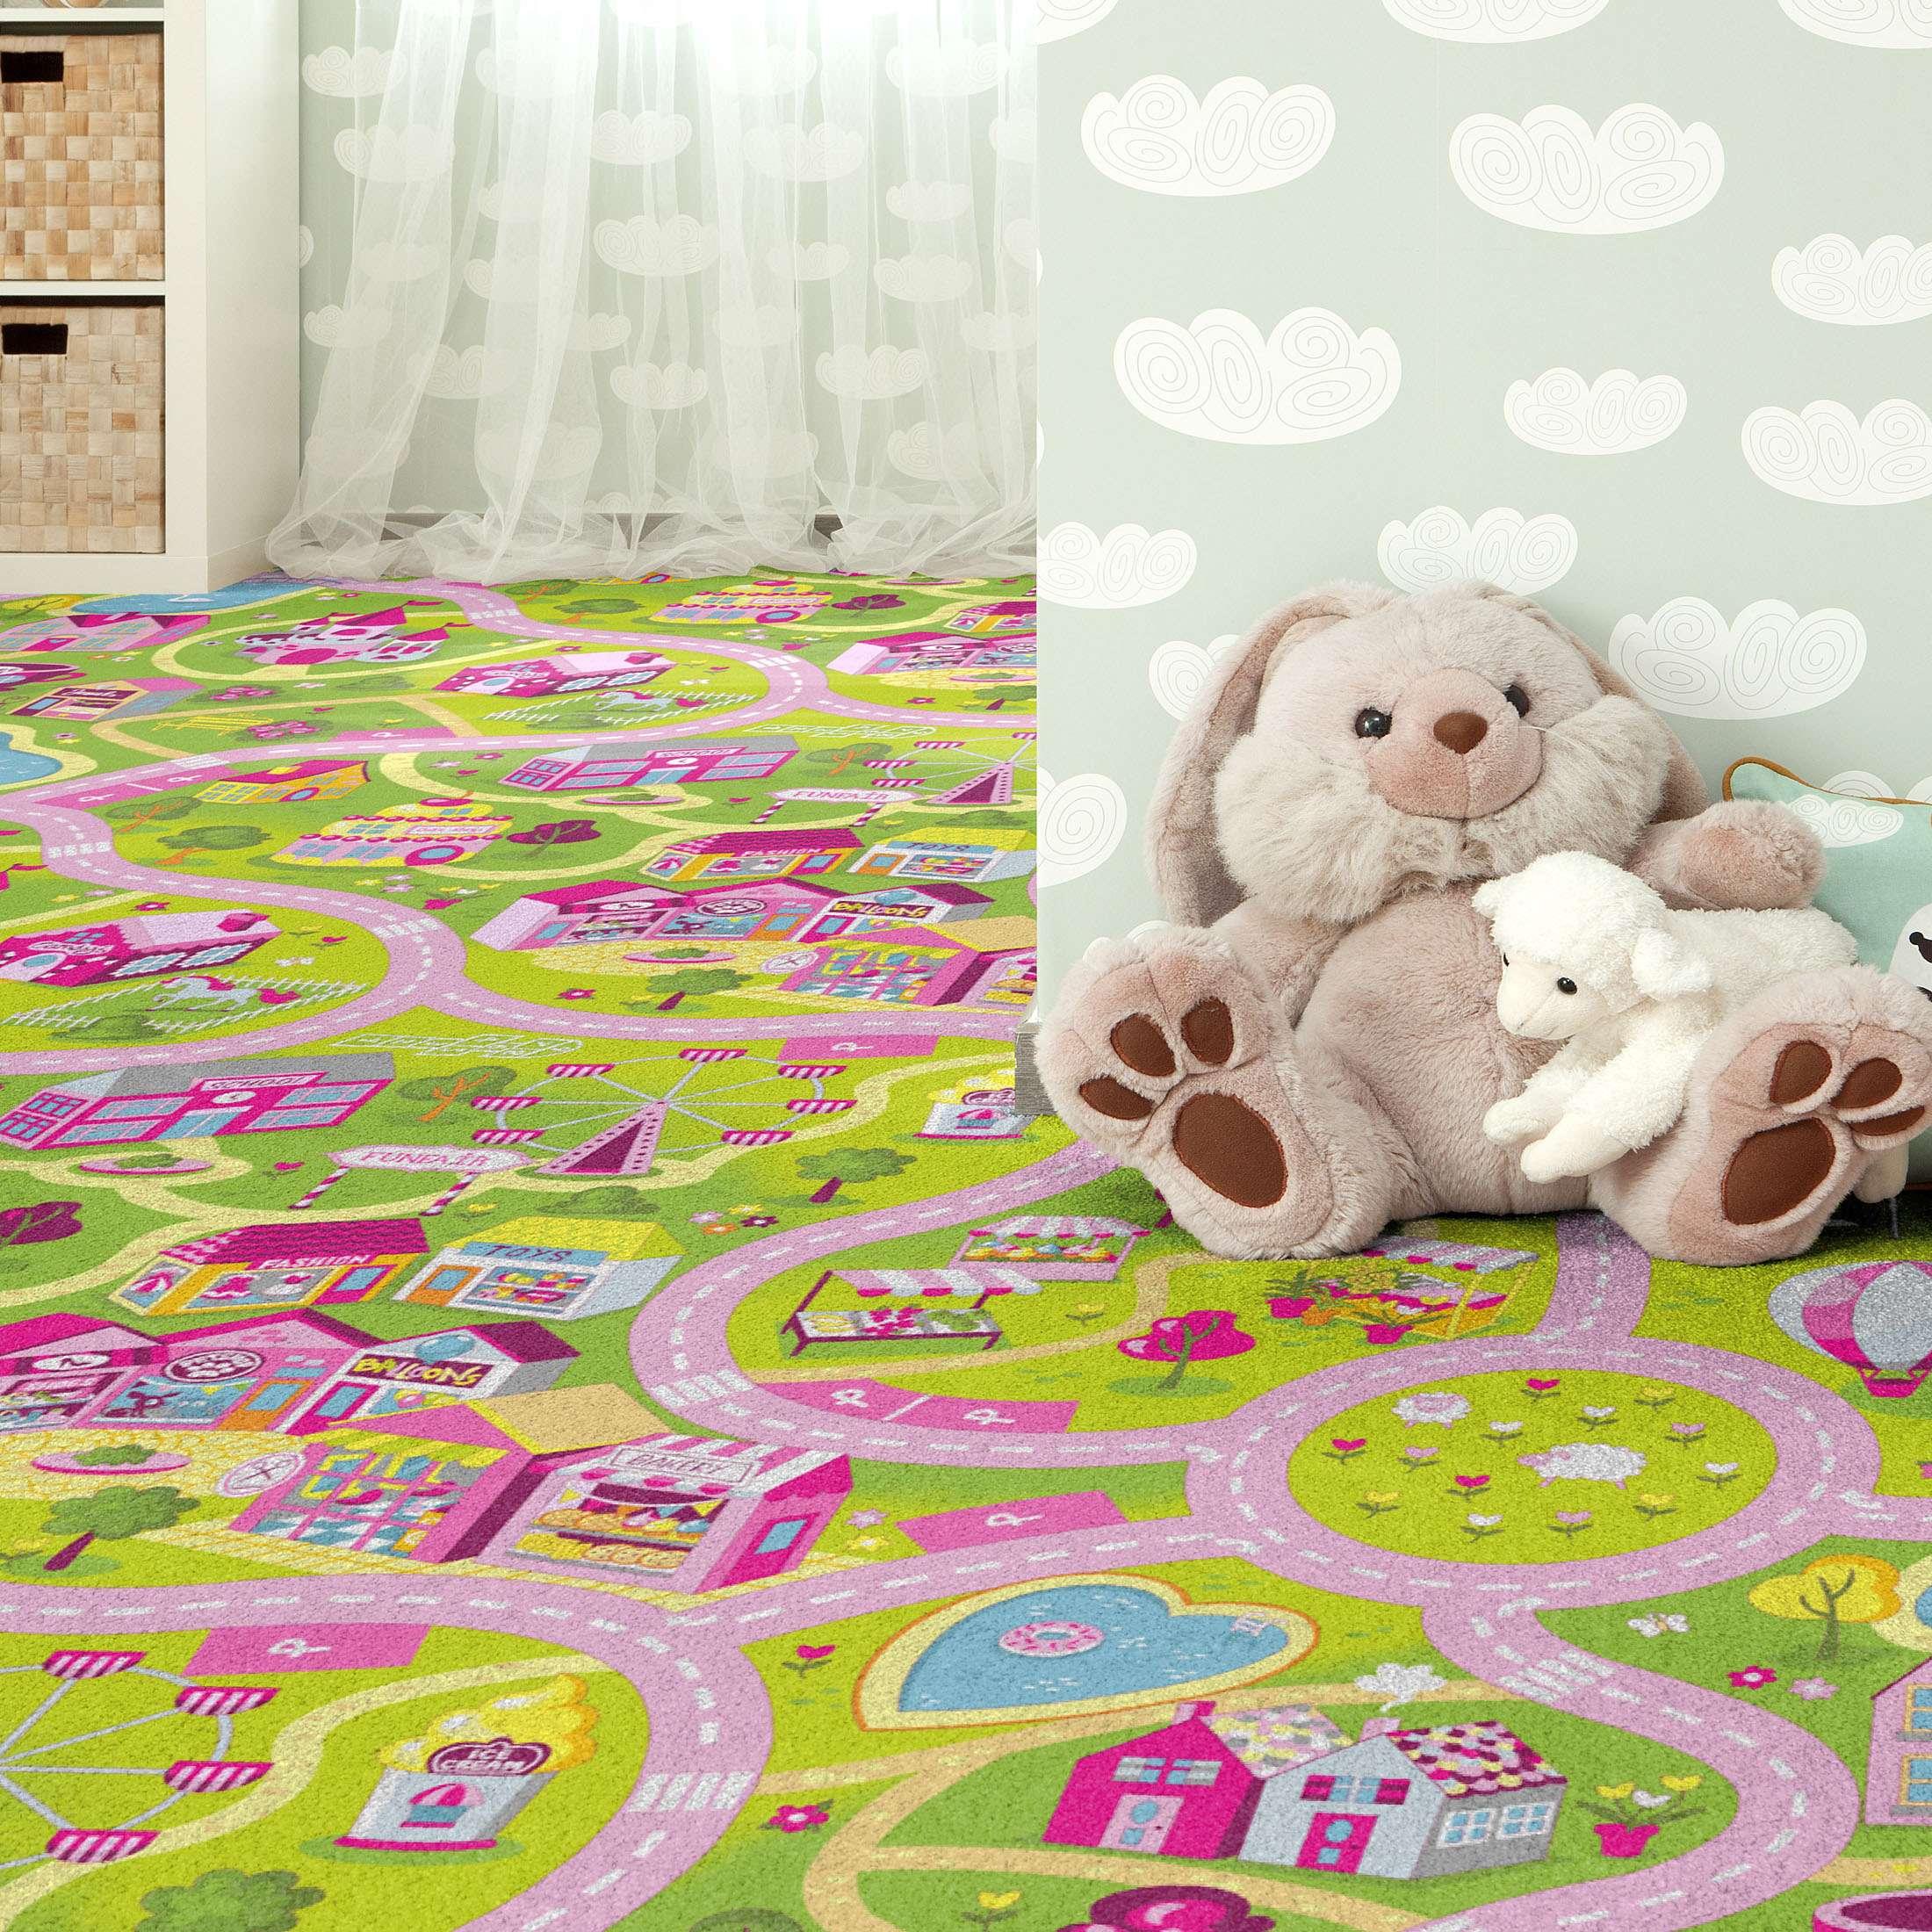 Full Size of Candy Town Kinderzimmer Teppichboden Von Kibek In Multicolor Regal Regale Sofa Weiß Kinderzimmer Teppichboden Kinderzimmer